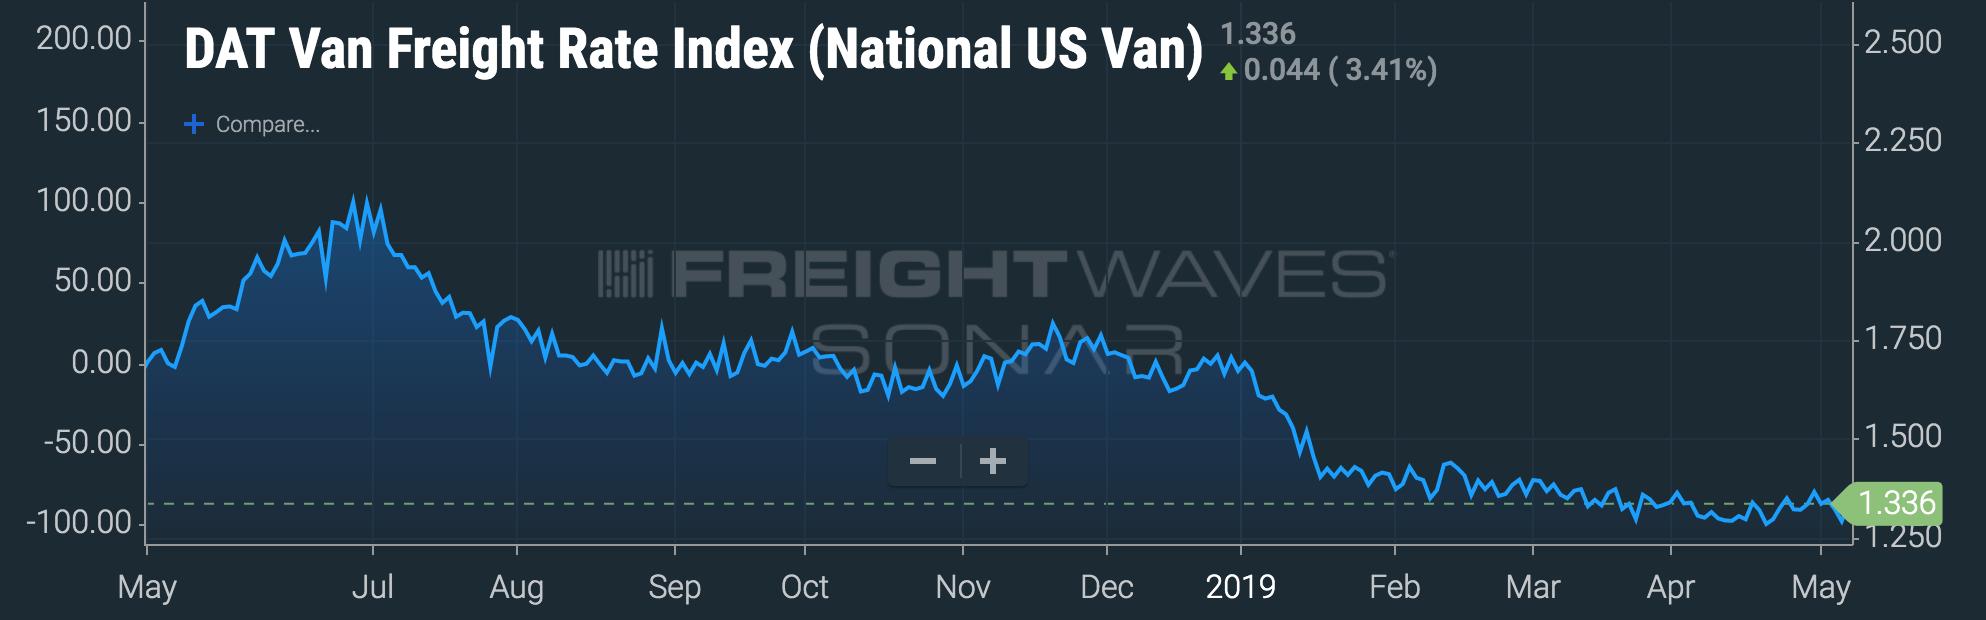 Image: FreightWaves SONAR featuring DAT data